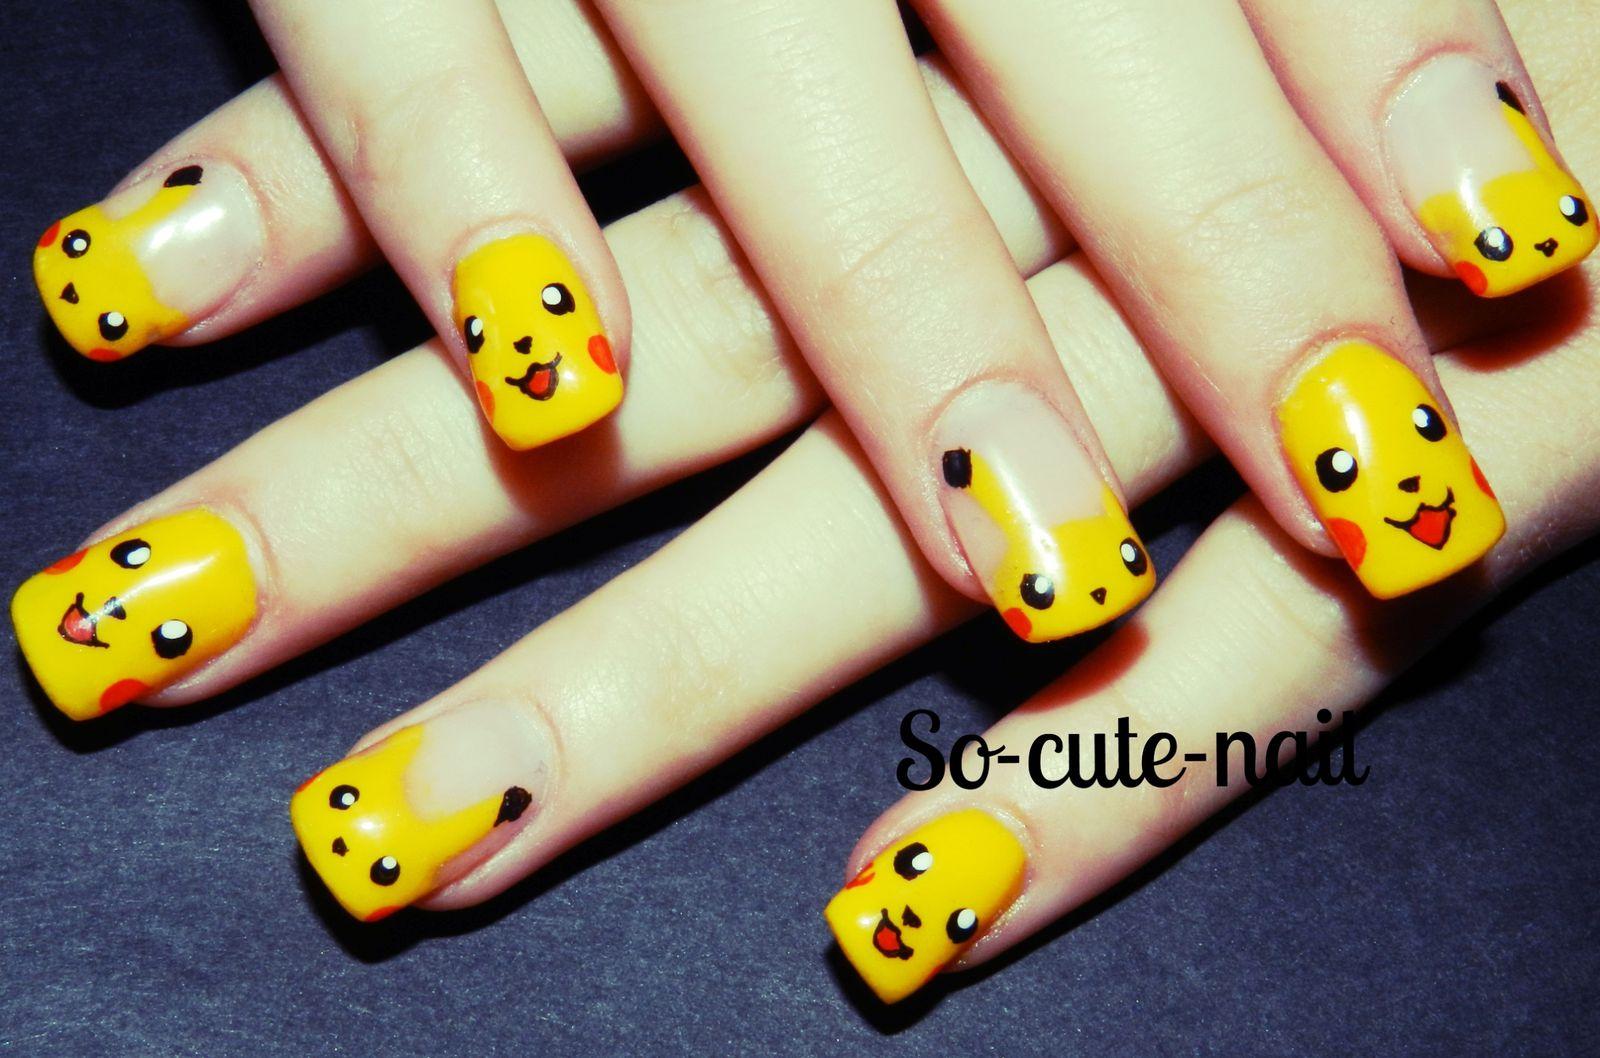 Pikachu pika pikachu...